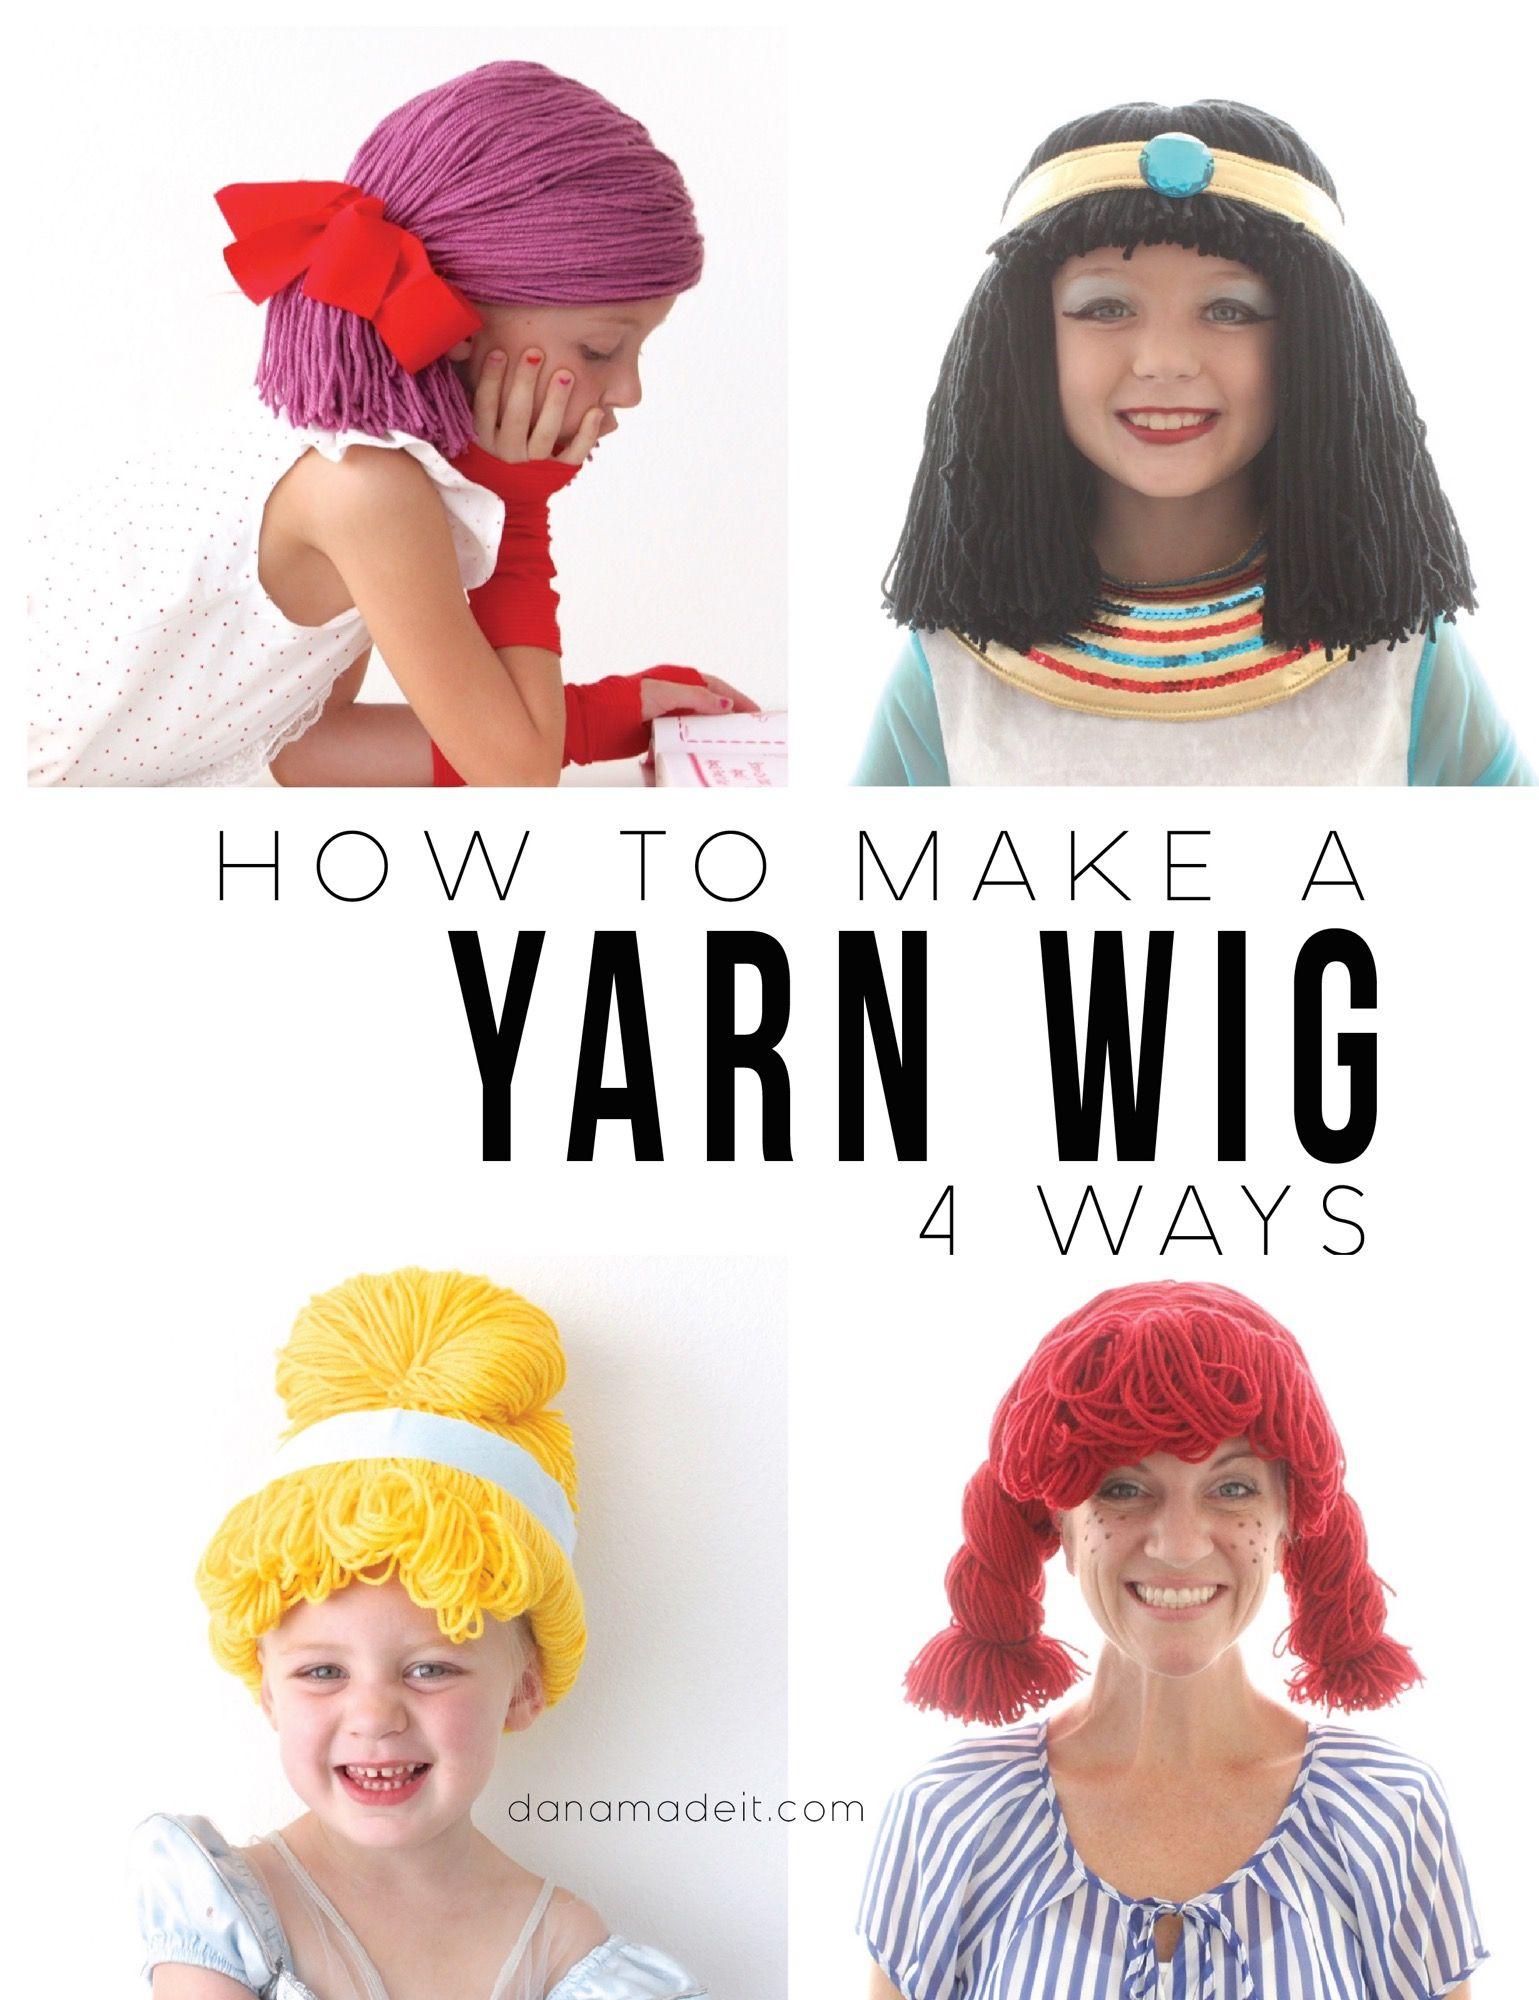 Tutorial How To Make A Yarn Wig 4 Ways